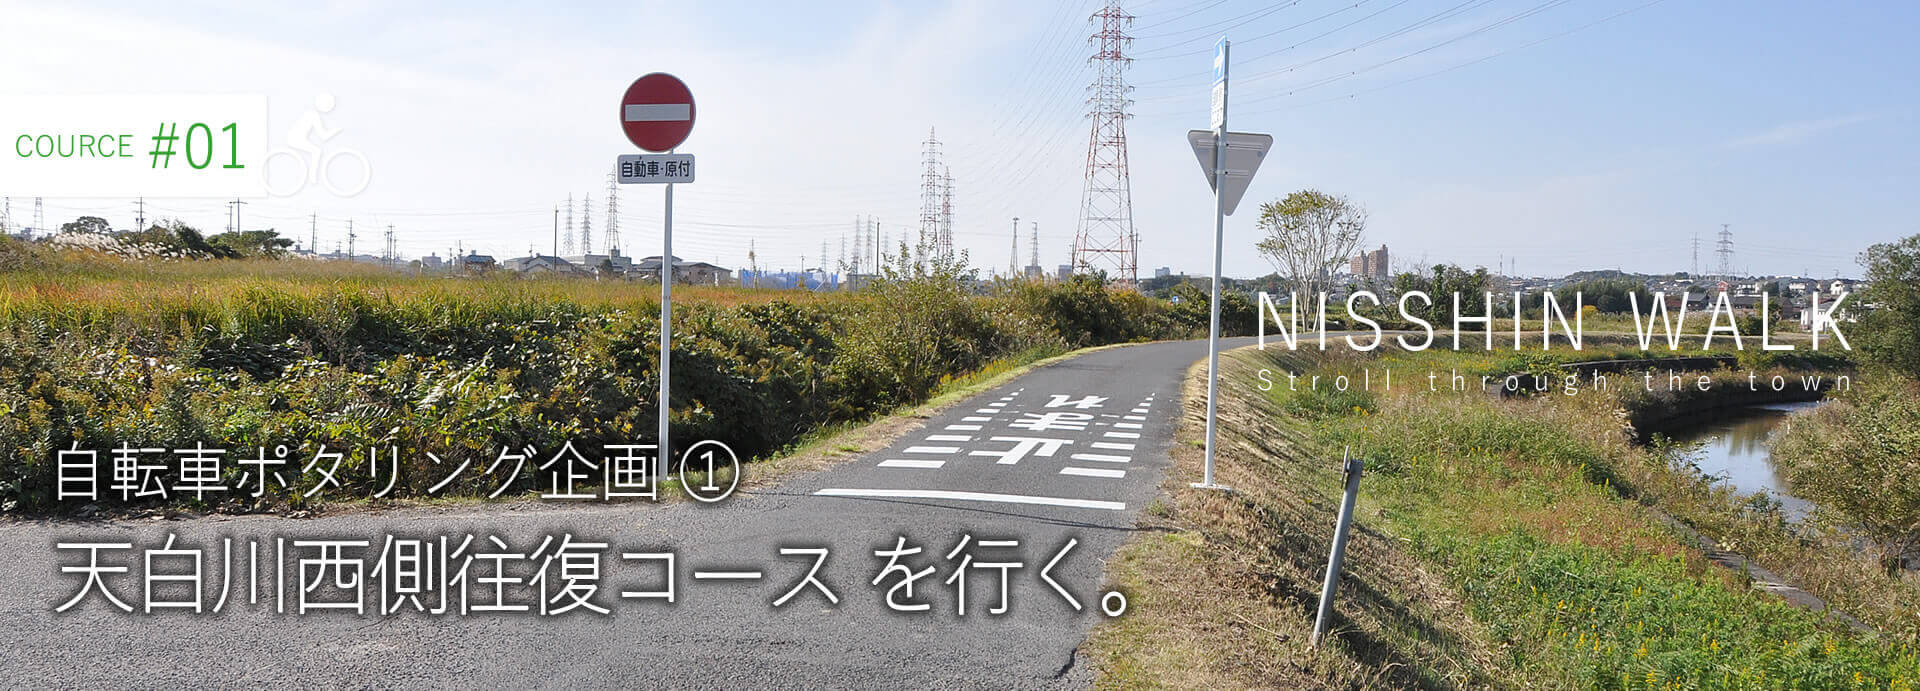 NISSHIN WALK 自転車ポタリング企画① 天白川西側往復コースを行く